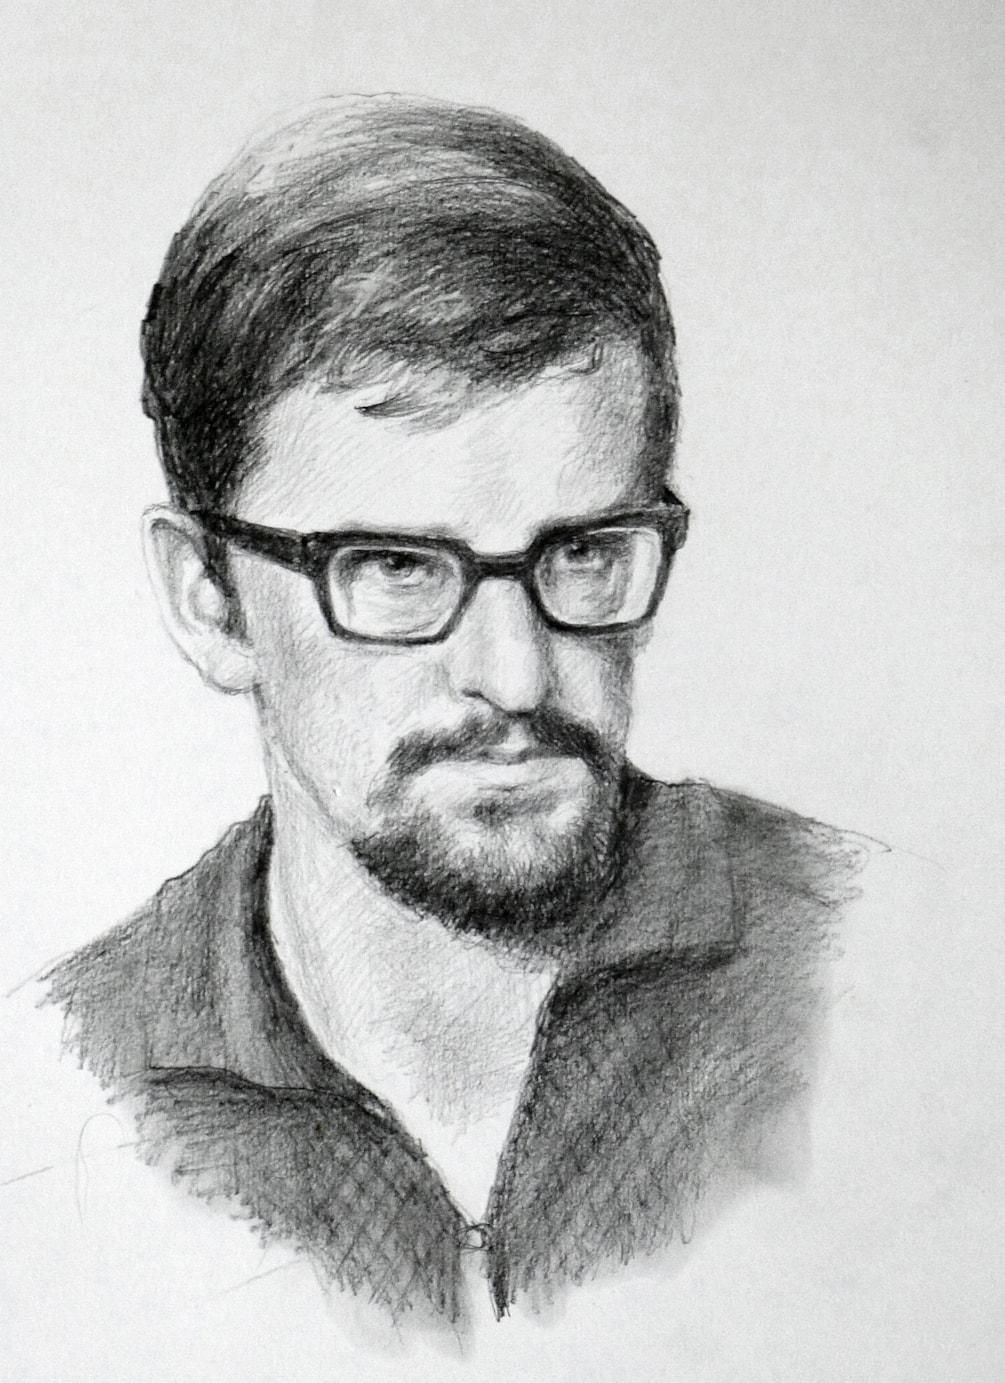 Self 1969